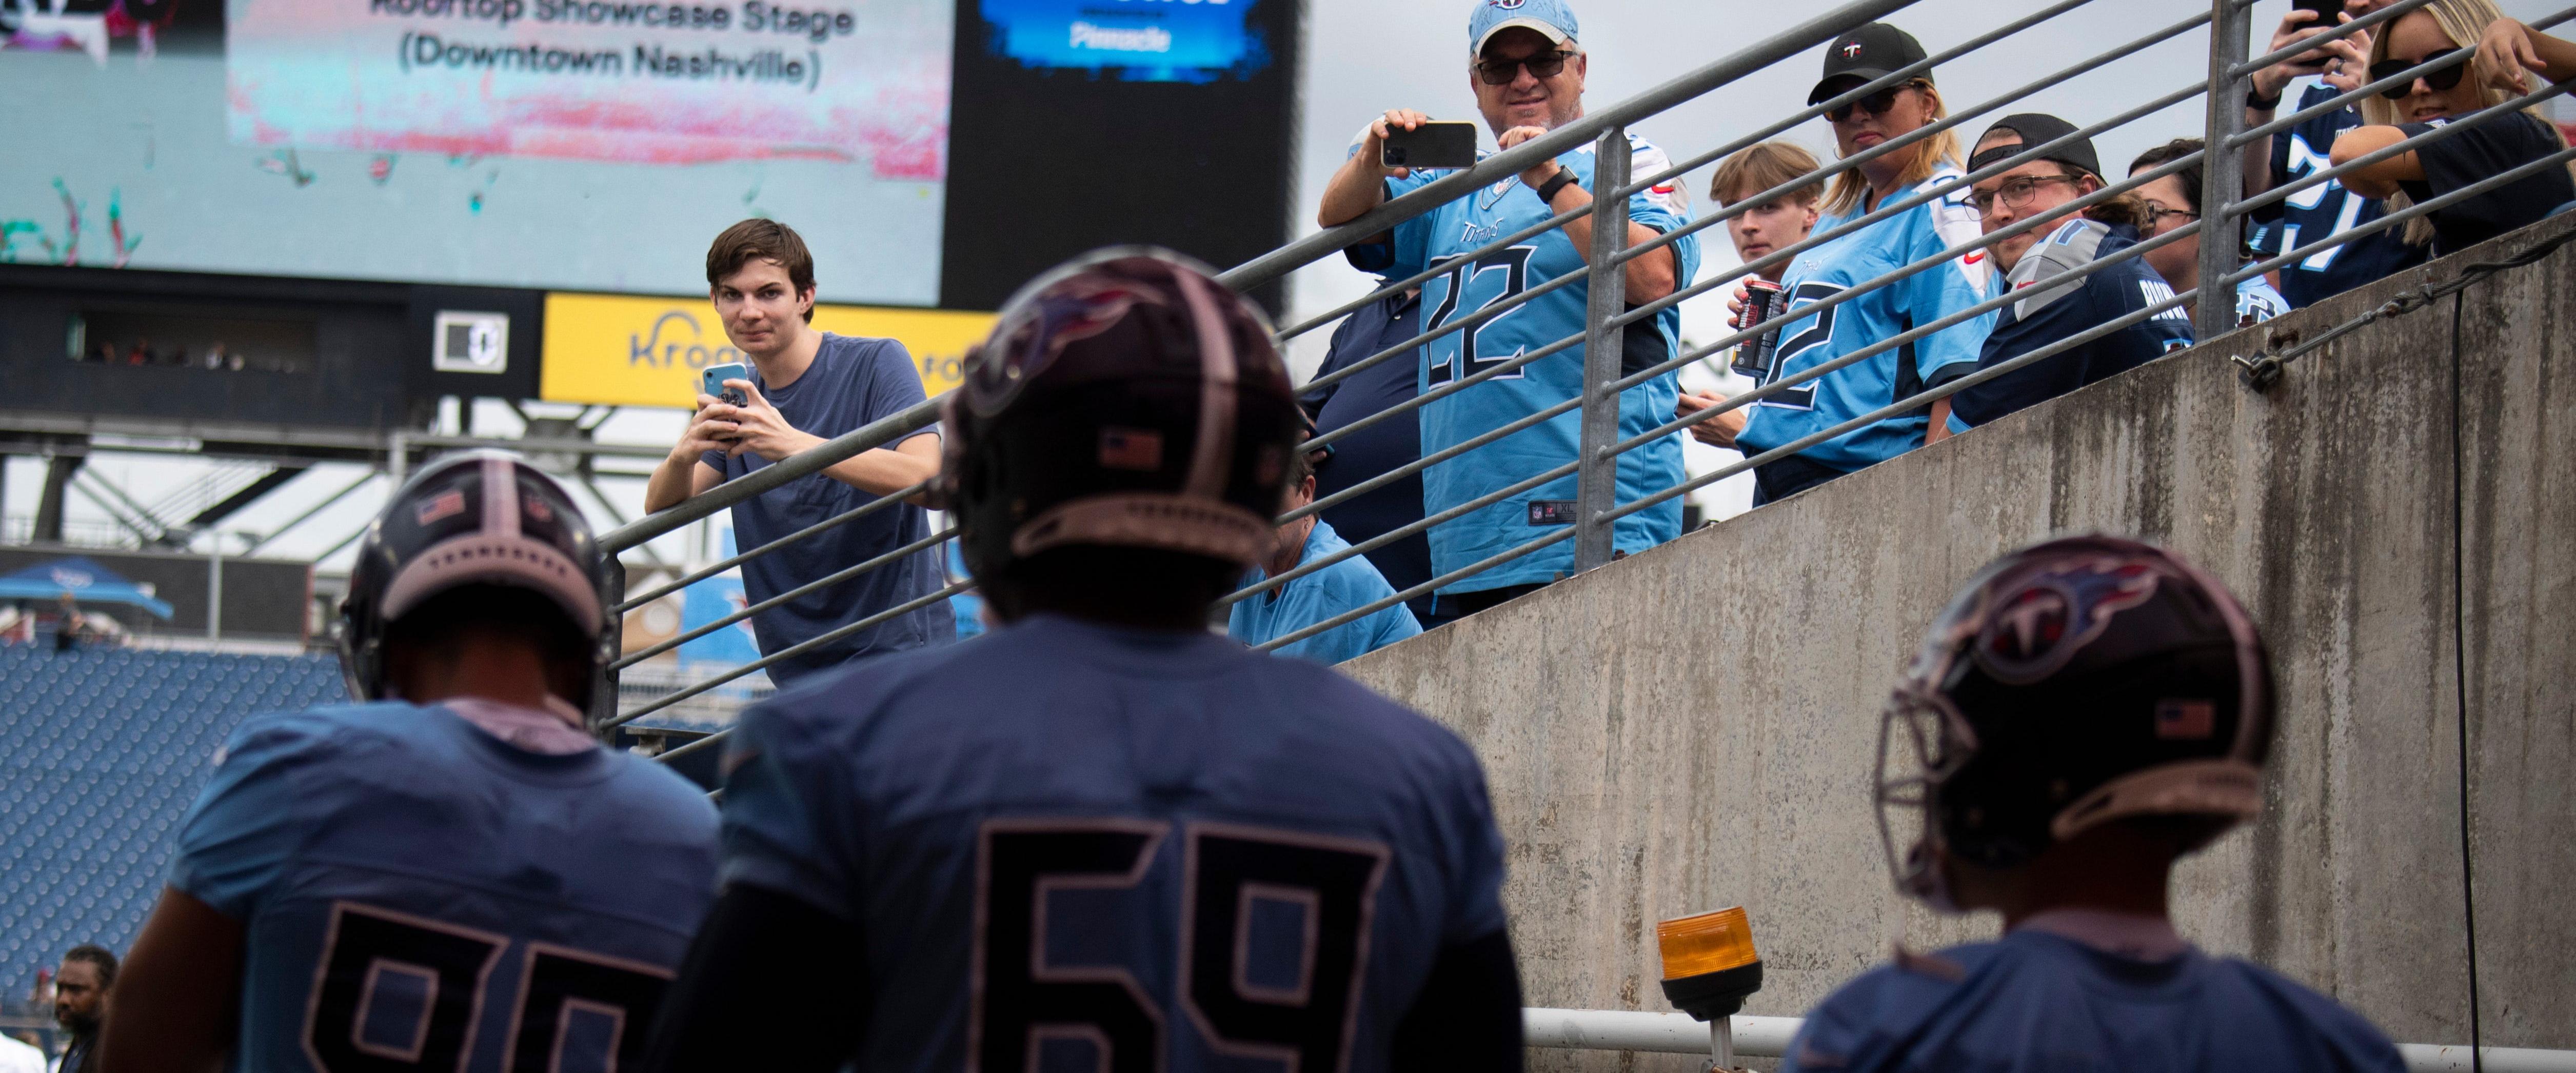 Titans fans enjoy a practice session at Nissan Stadium